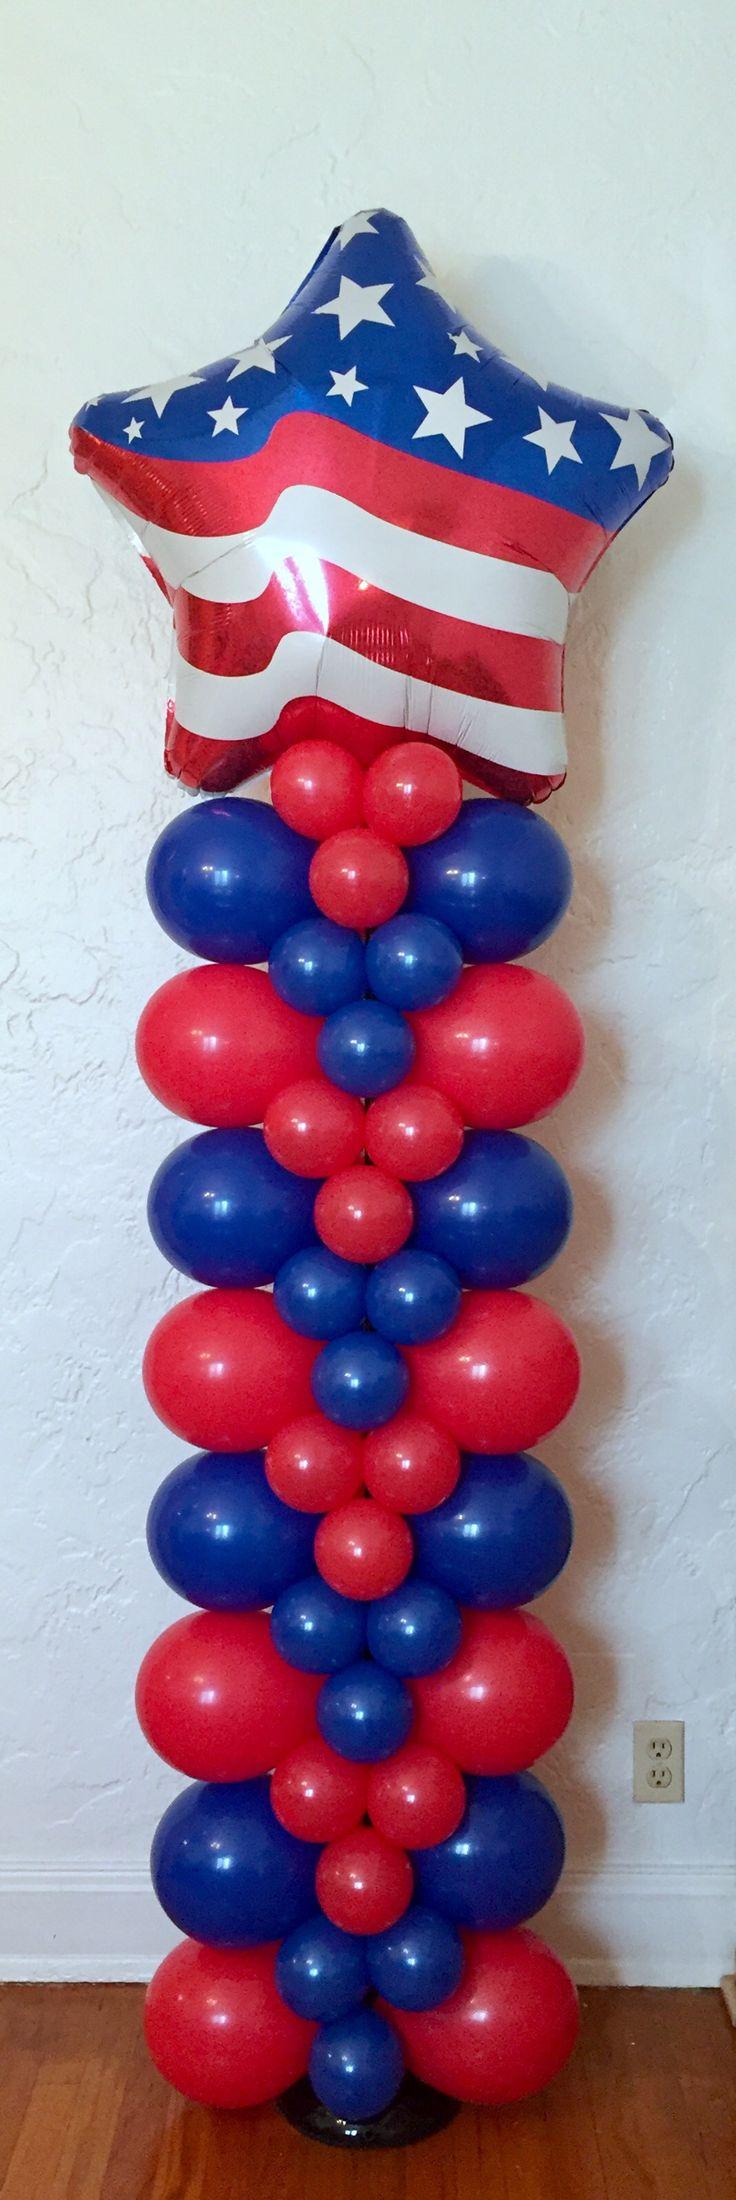 Red White & Blue Star Patriotic Balloon Column